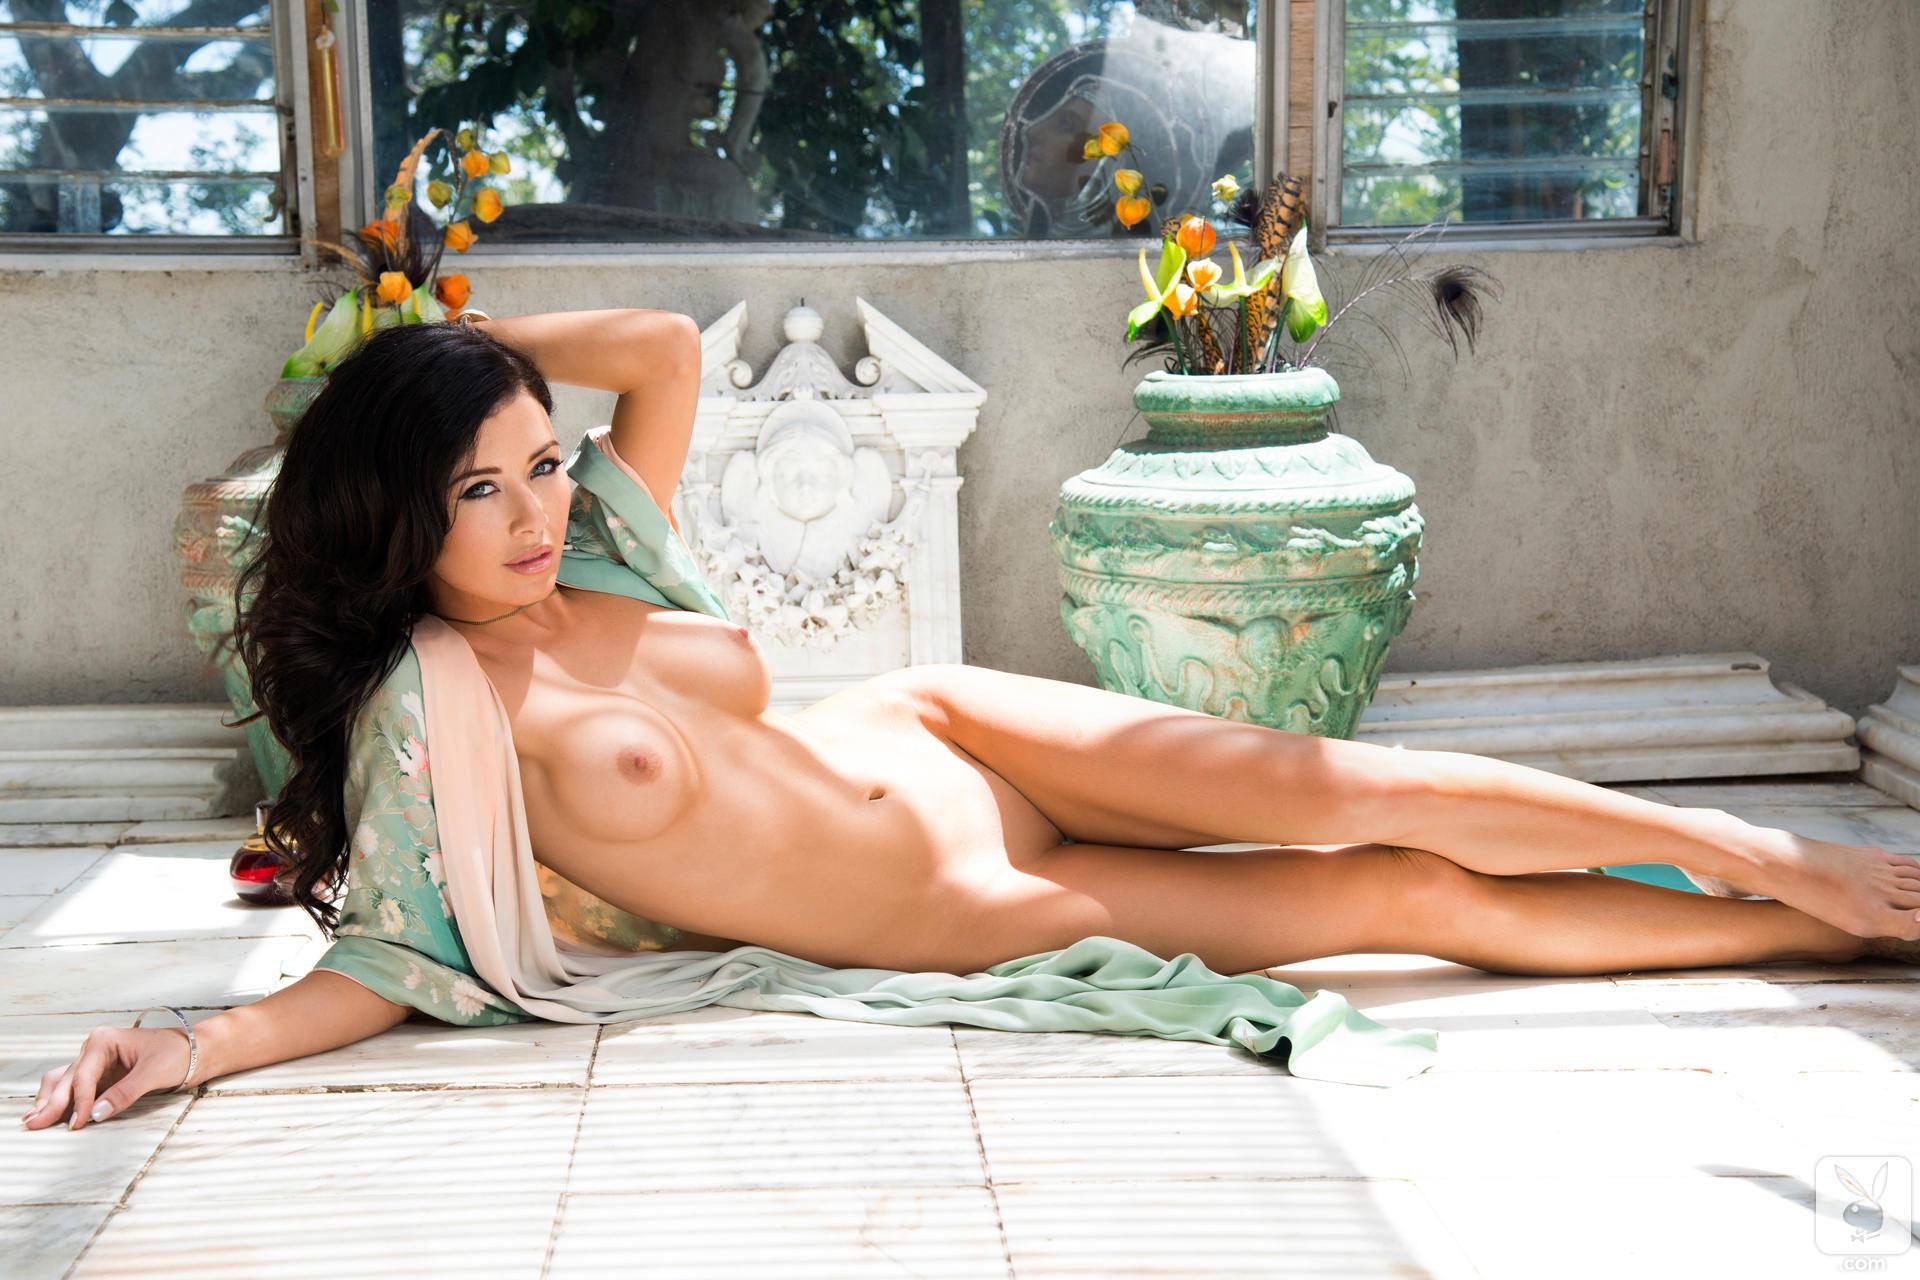 gemma-lee-farrell-brunette-nude-playboy-06